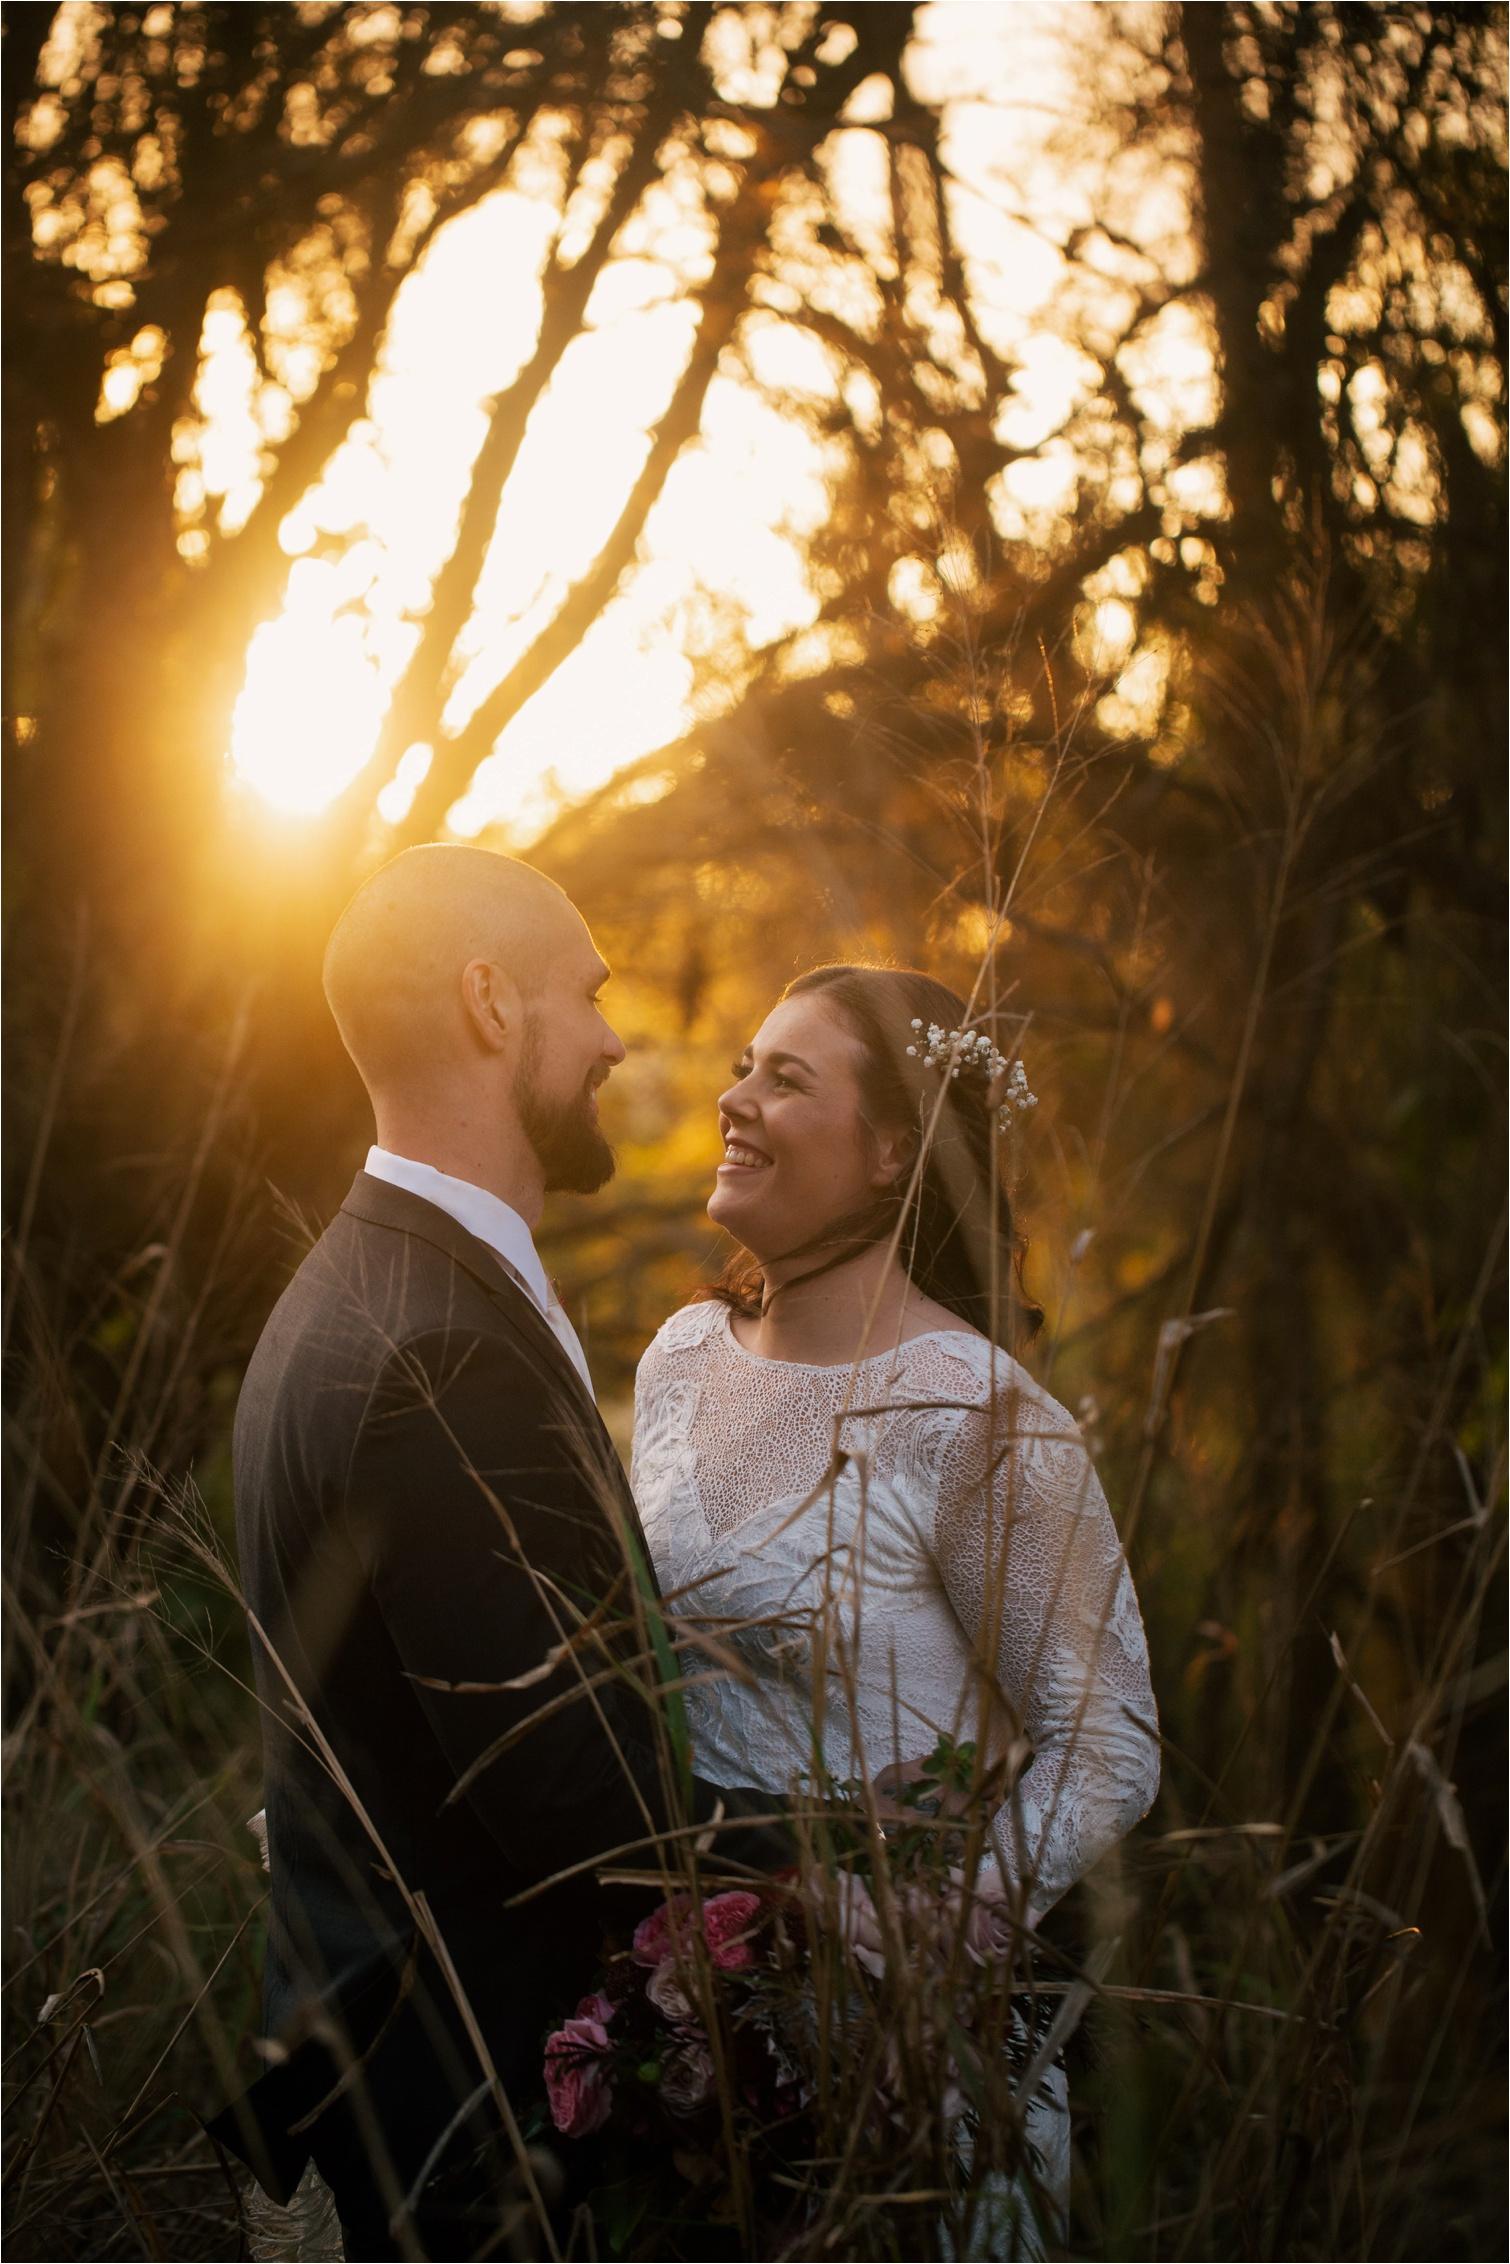 Hillstone_Brisbane_Wedding_Photography_0052.jpg